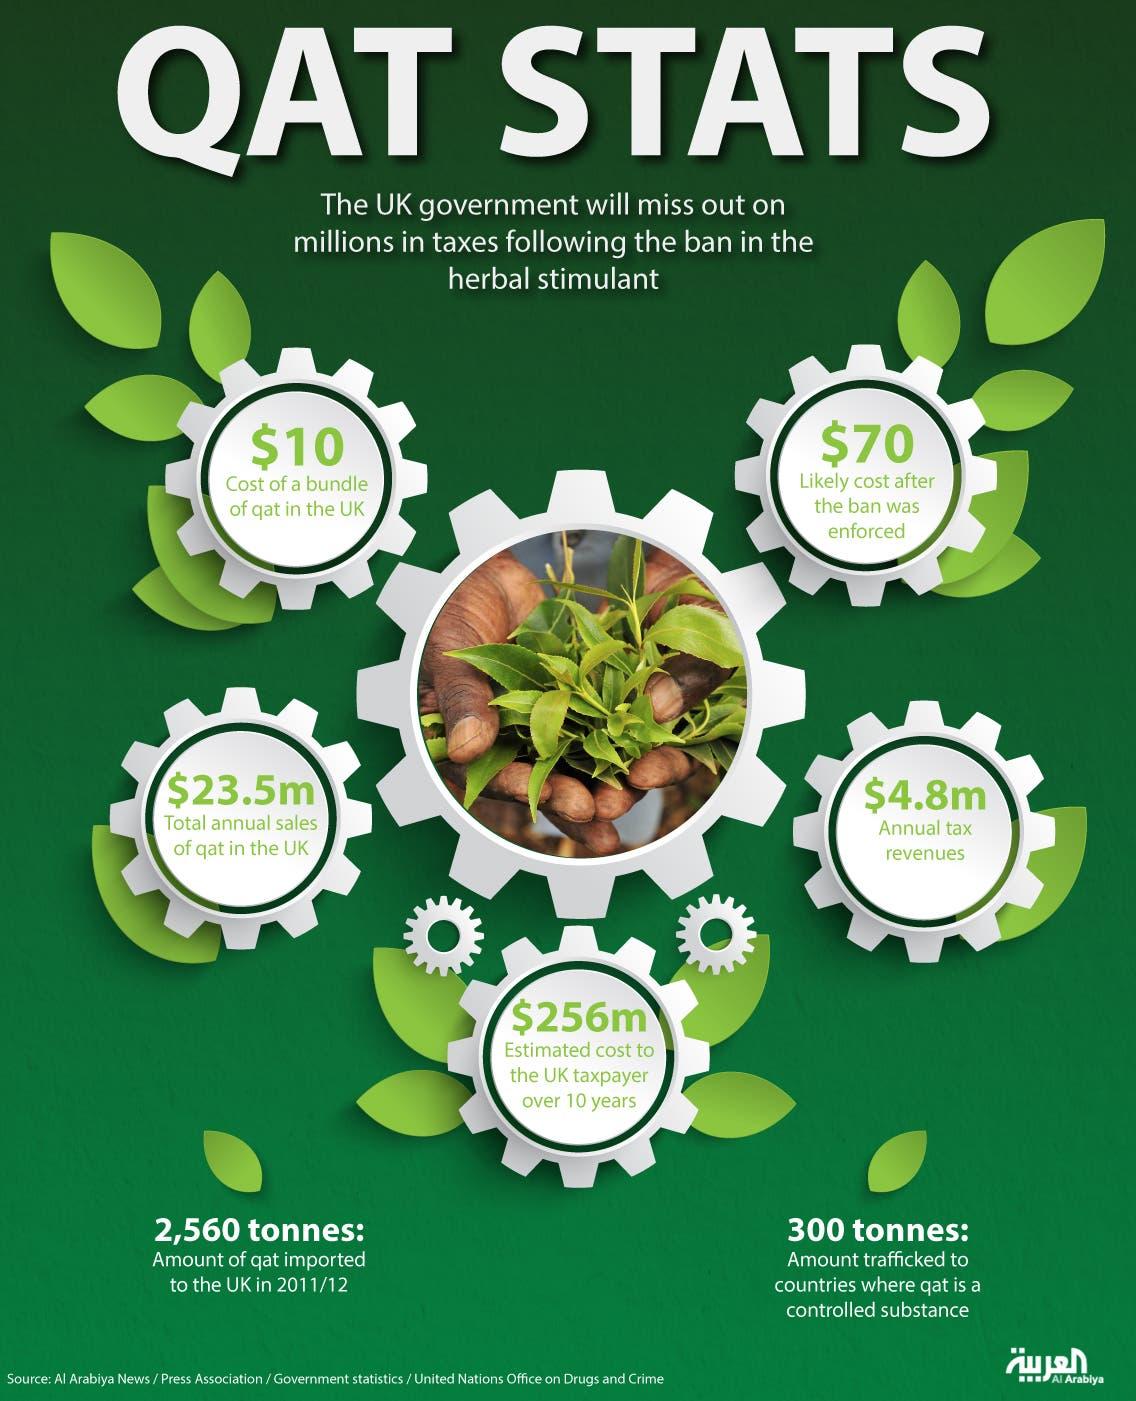 Infographic: Qat stats